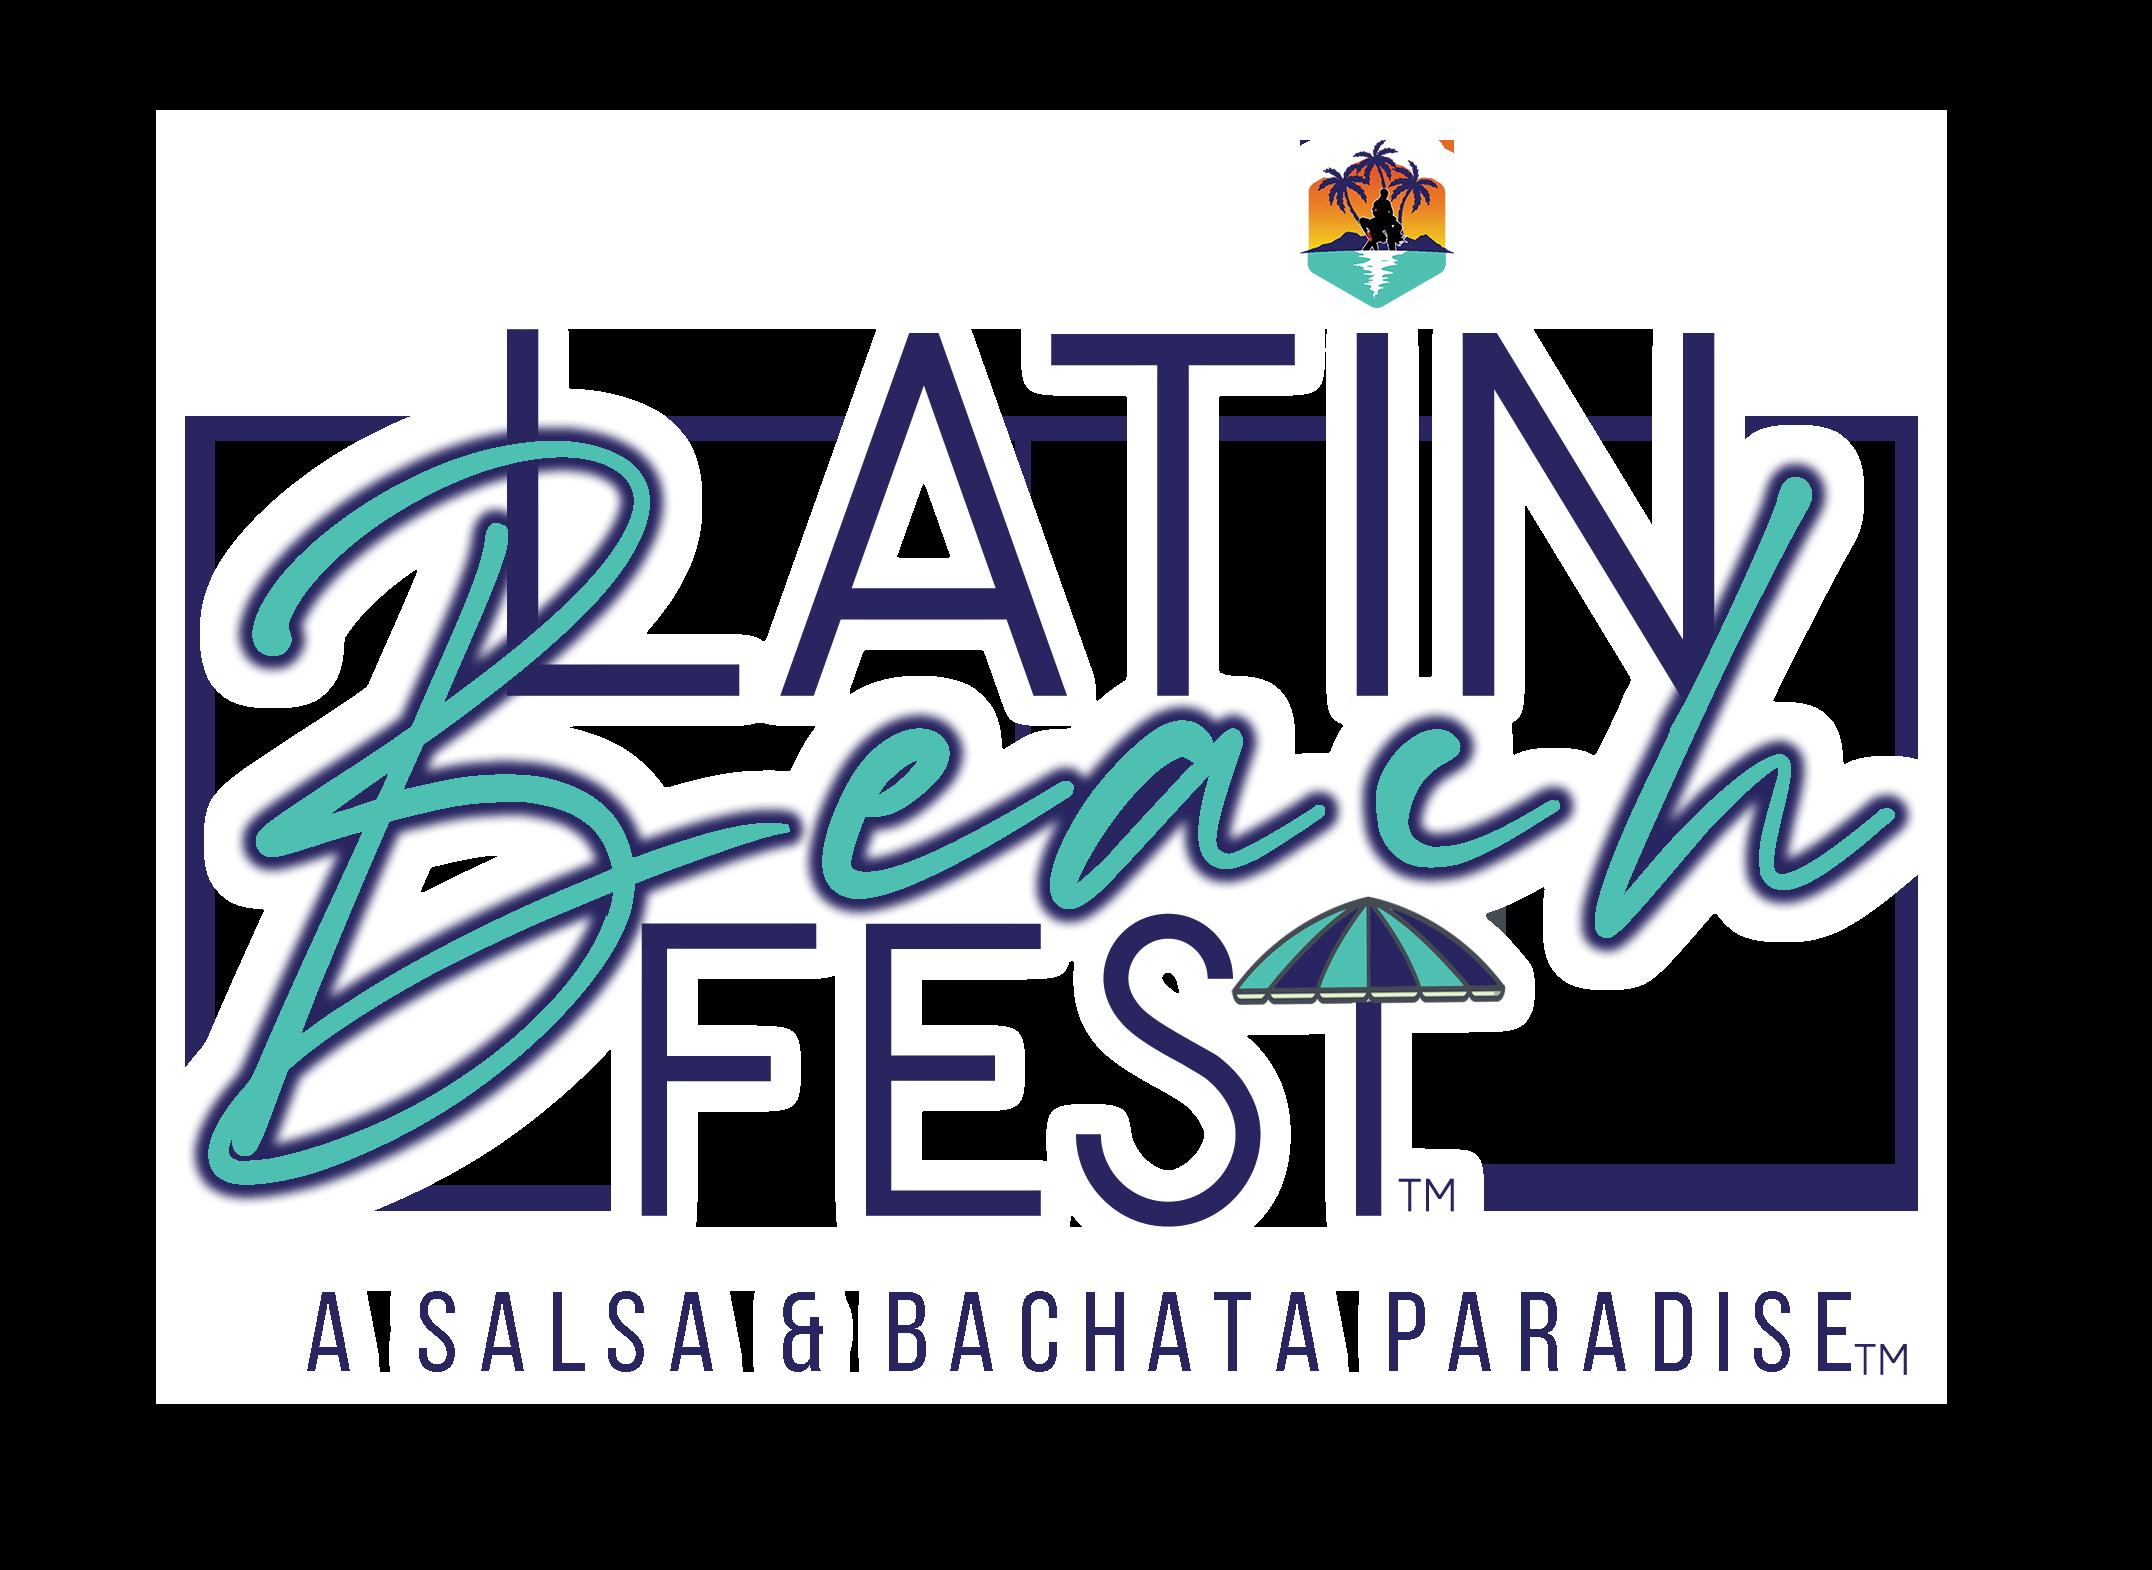 Latin-Beach-Fest-Combo-dropshadow